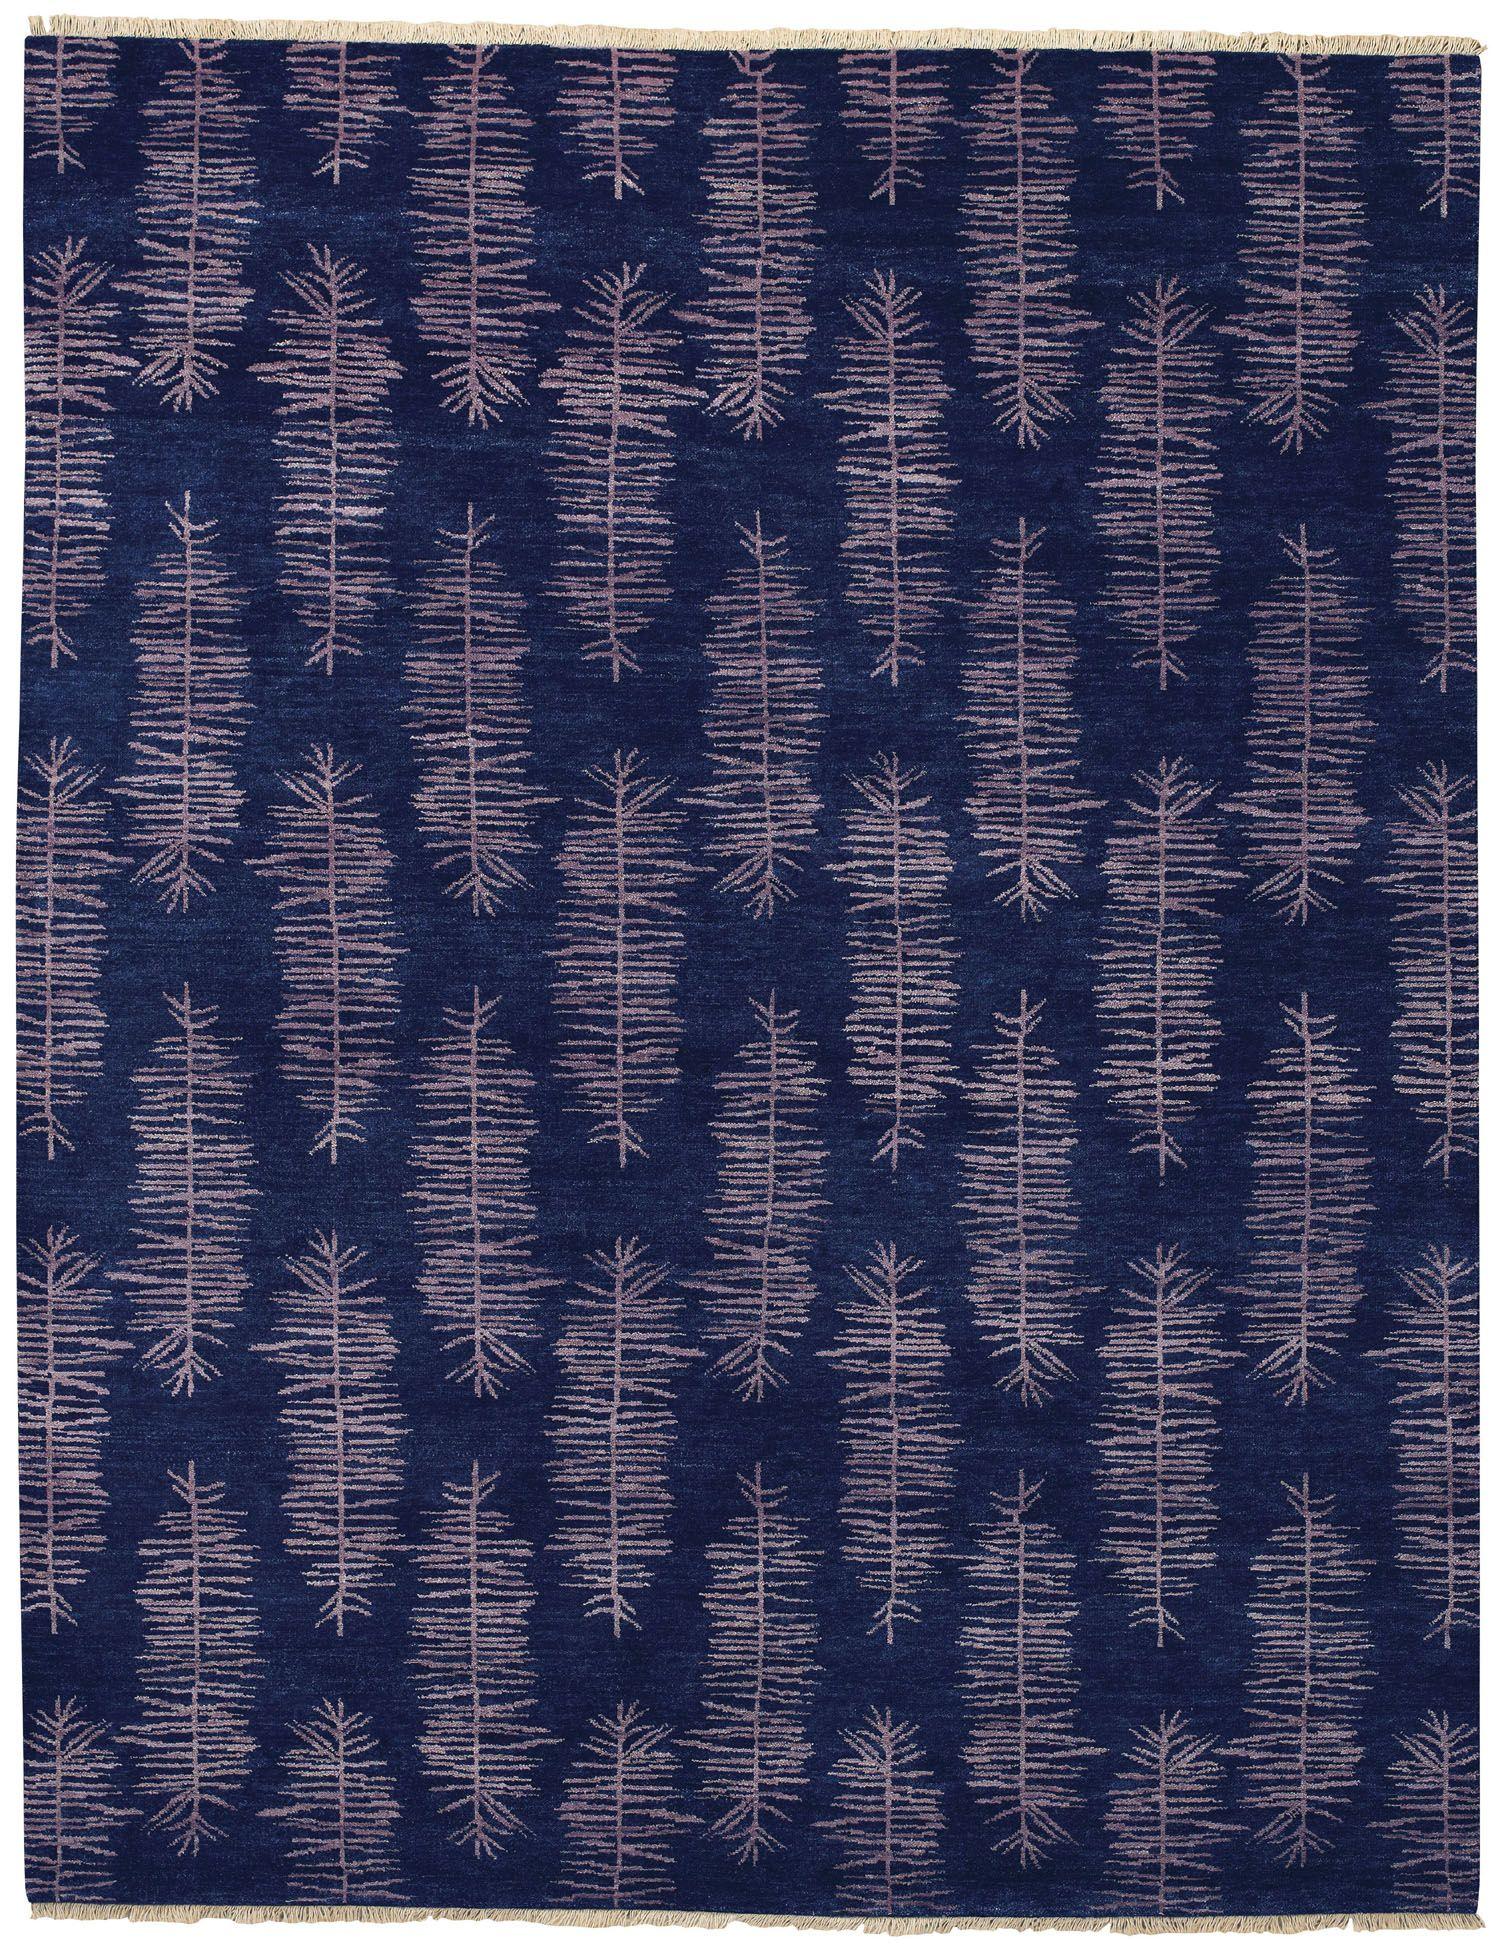 Aspen Midnight Blue Rug [humanely sheered wool version] | My ...